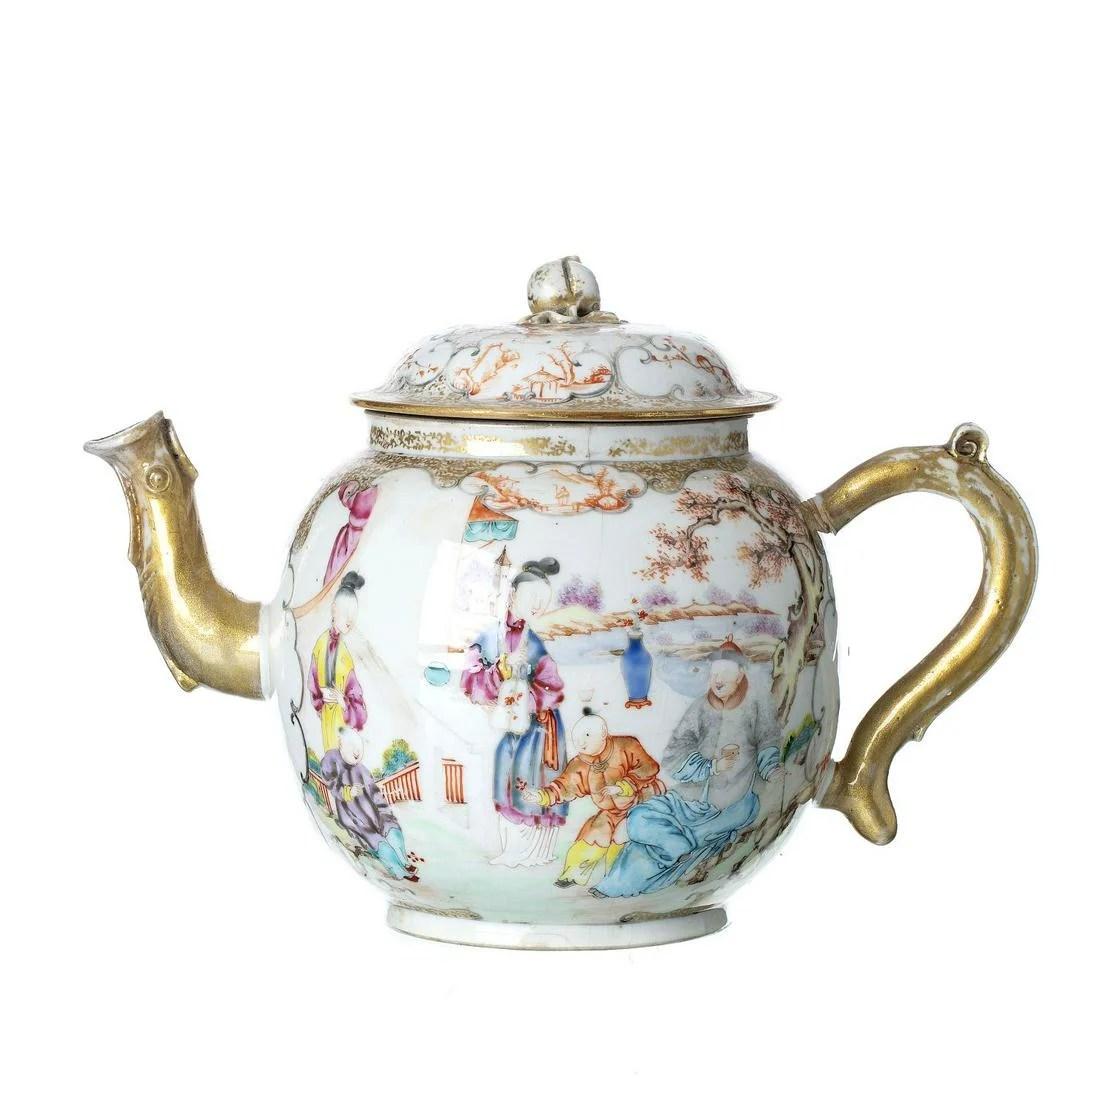 Large 'Mandarin' teapot in Chinese porcelain, Qianlong